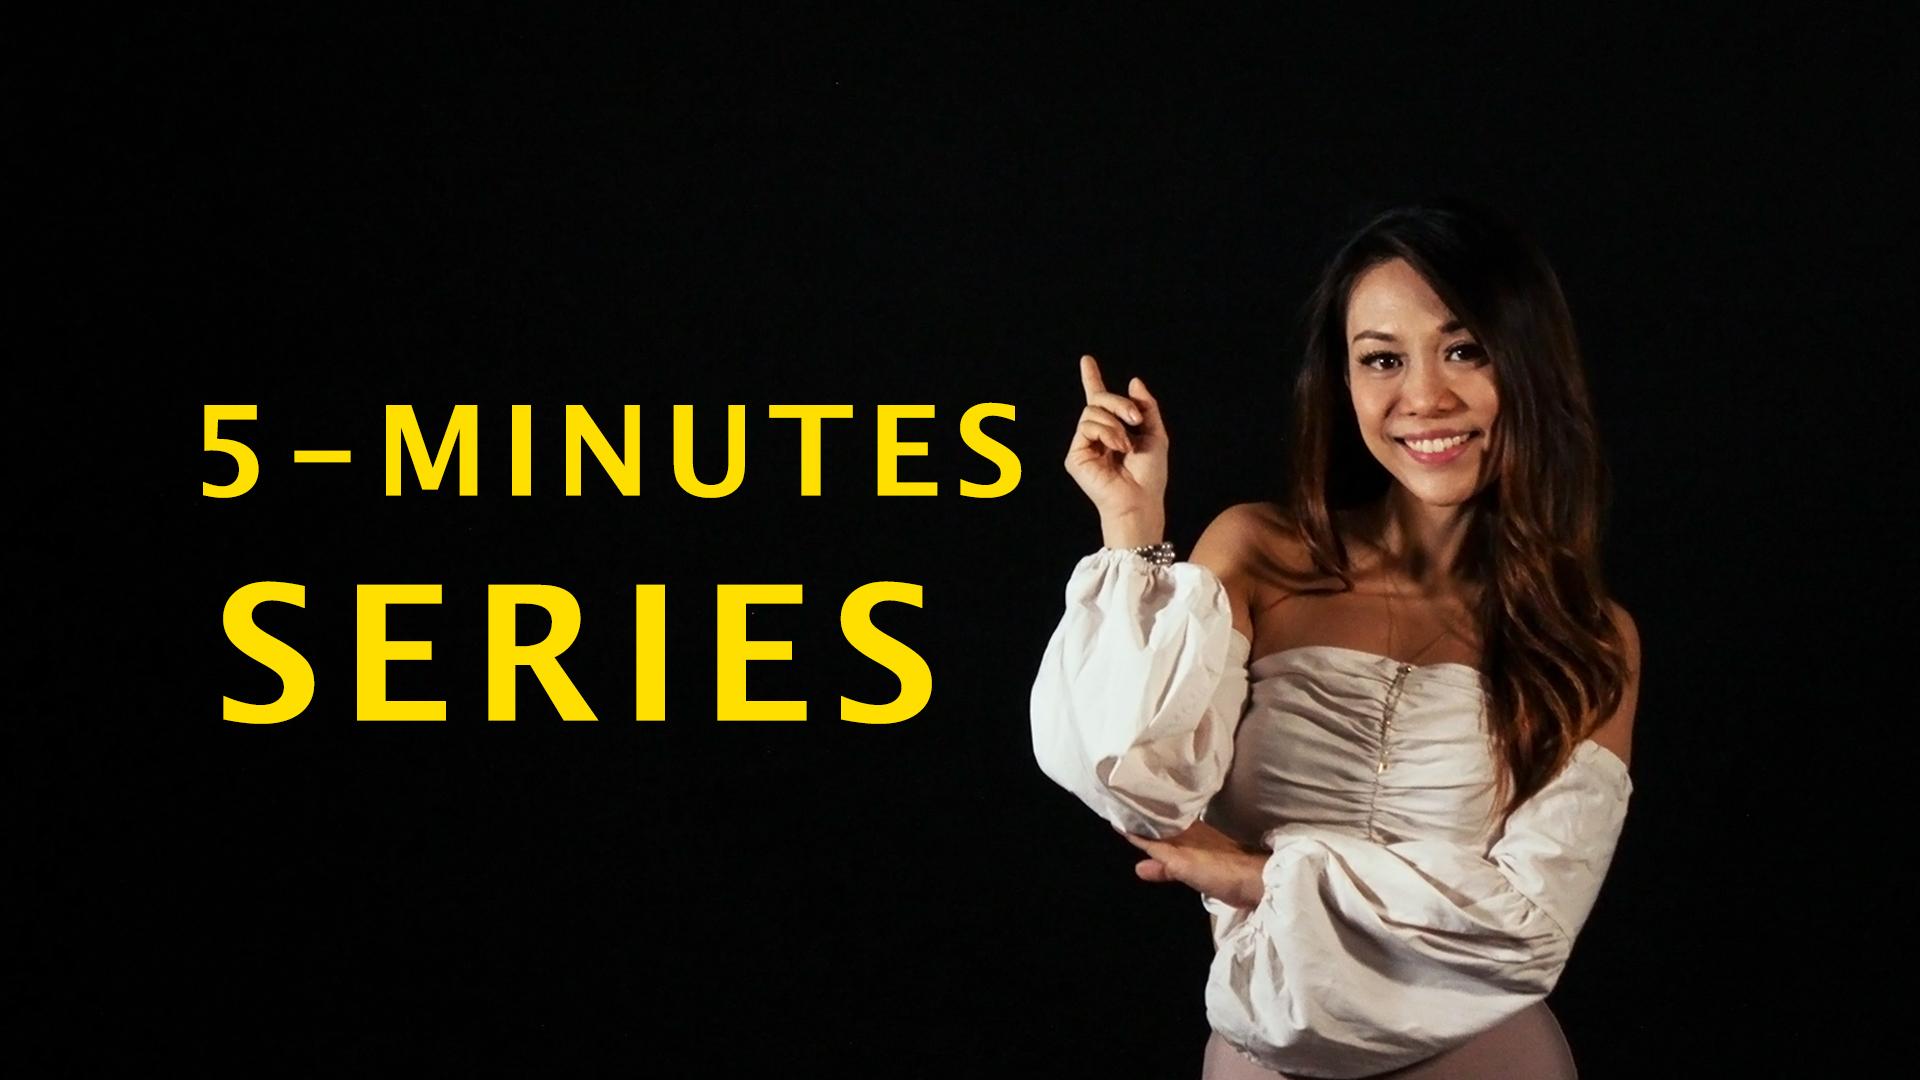 5 Minutes Series Thumbnail.jpg